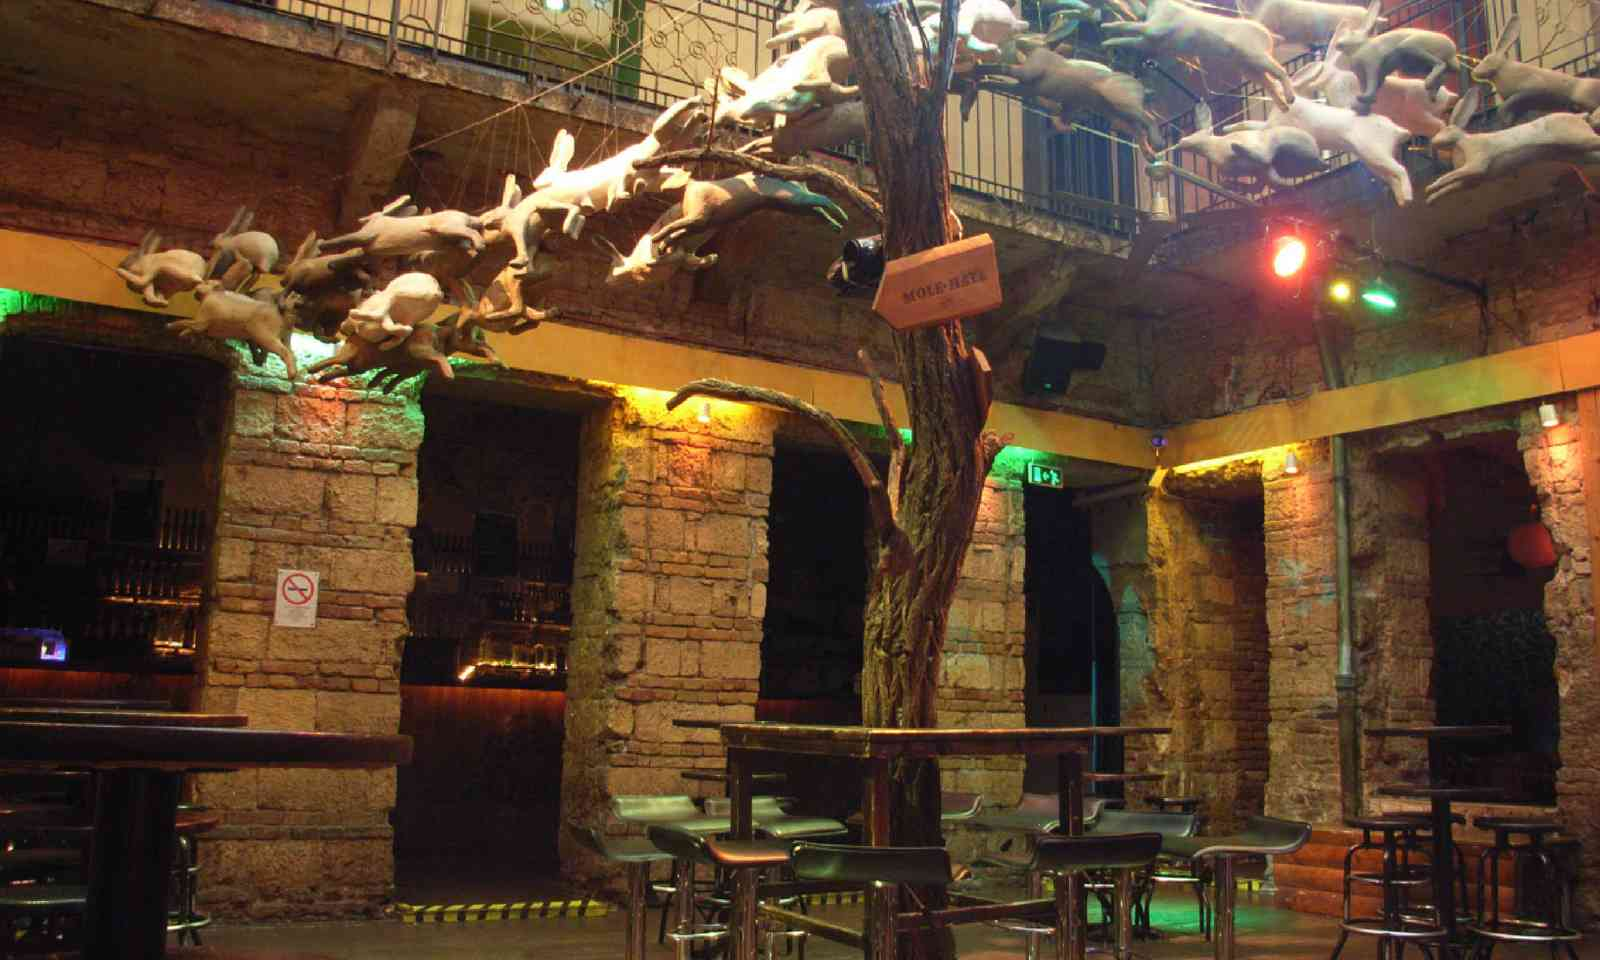 Instant pub (Flickr Creative Commons: JaSchau)